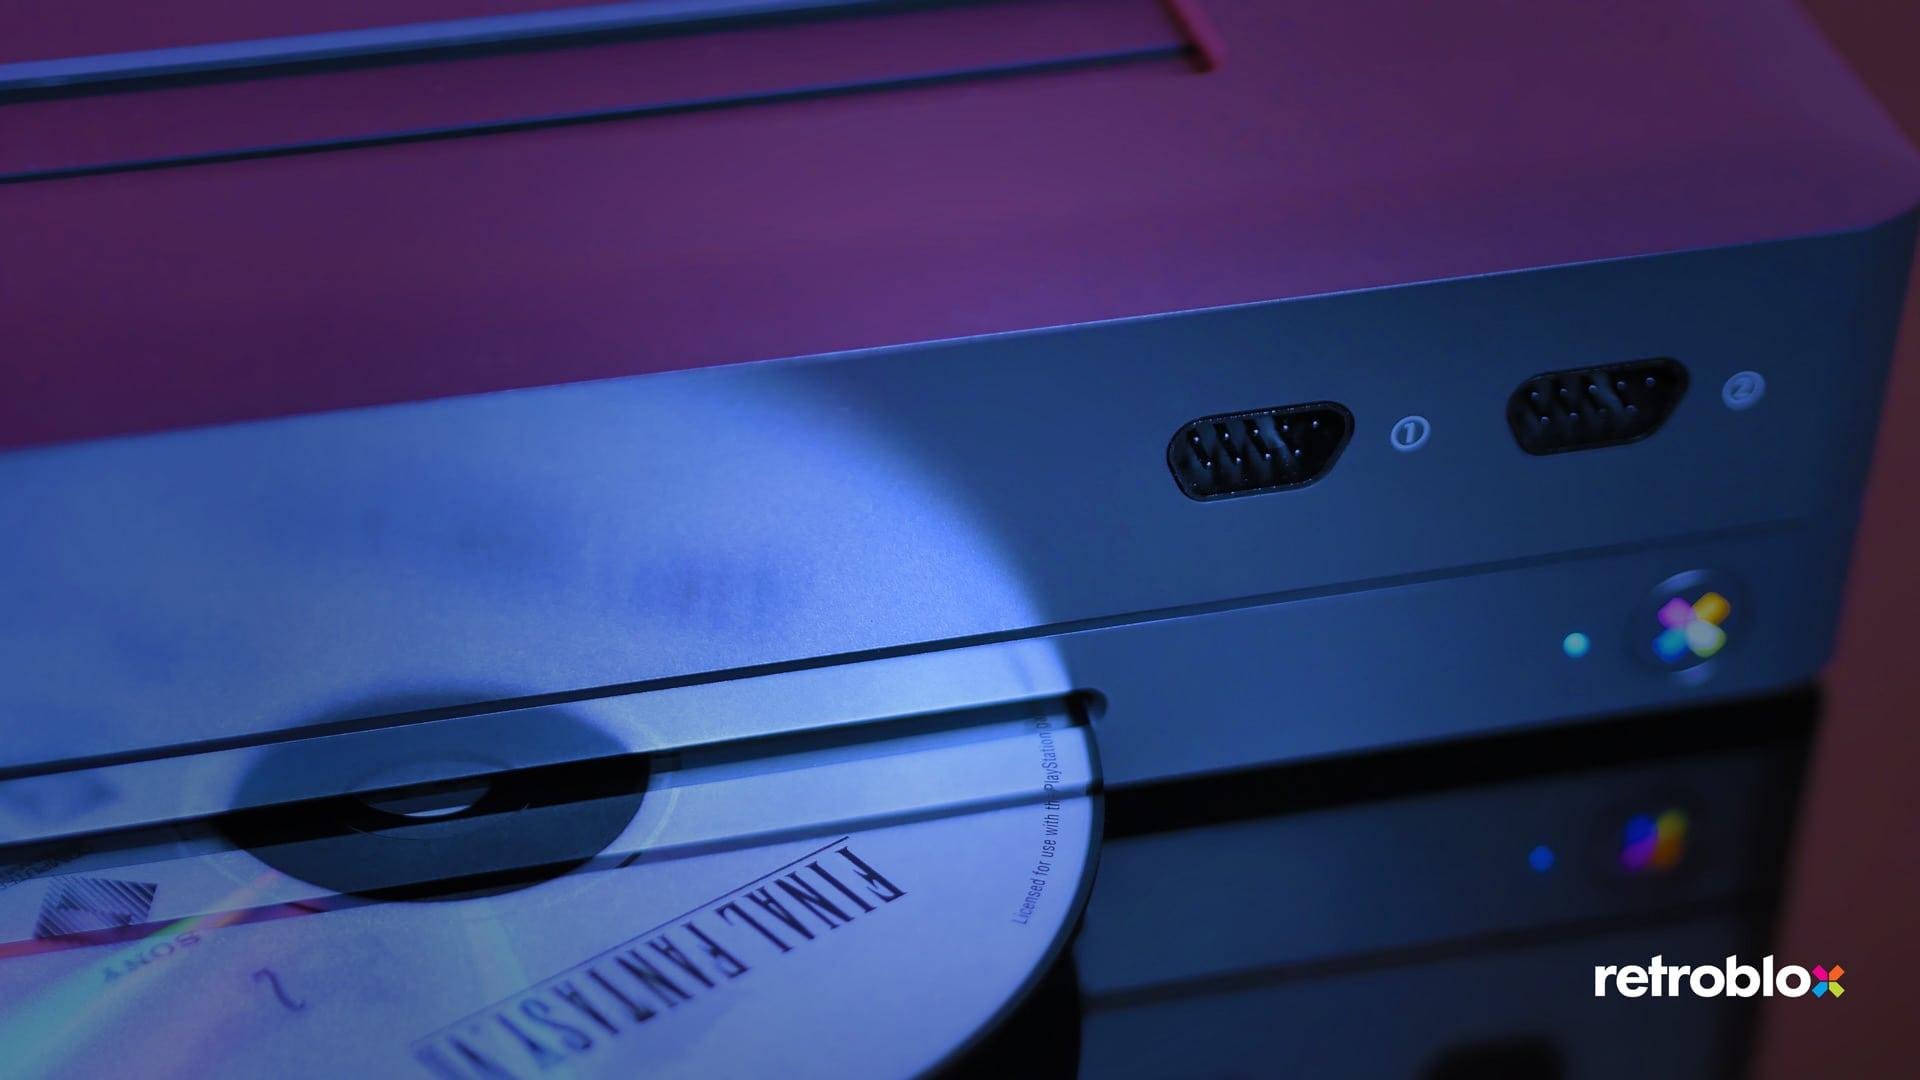 1 rbxpress 1920x1080 - Nowa konsola Polymega ze wsparciem m.in. dla PlayStation oraz Sega Saturn